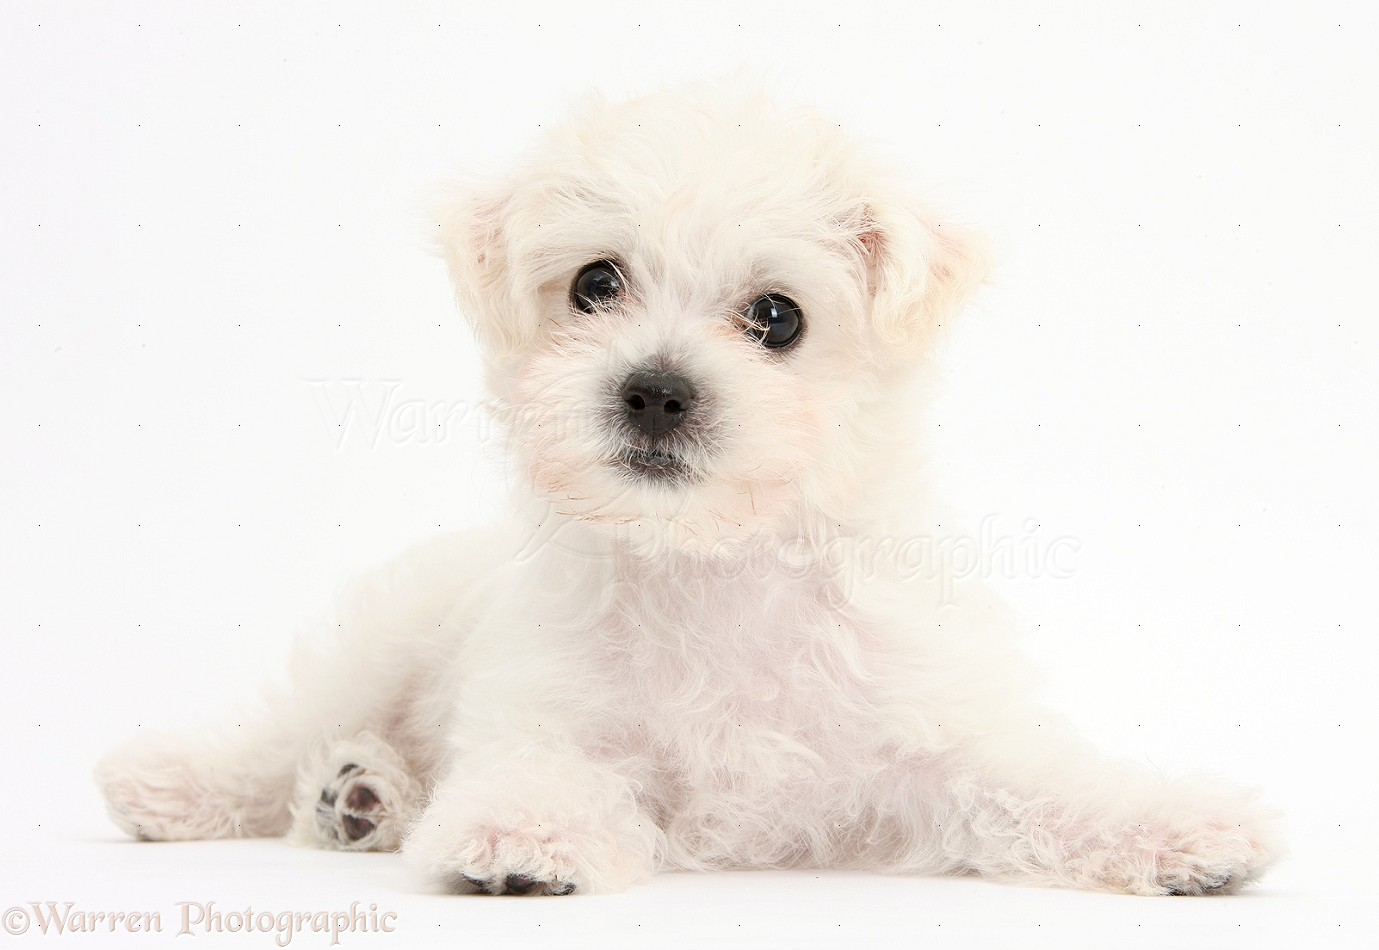 Dog Cute White Bichon X Yorkie Puppy Photo Wp38681